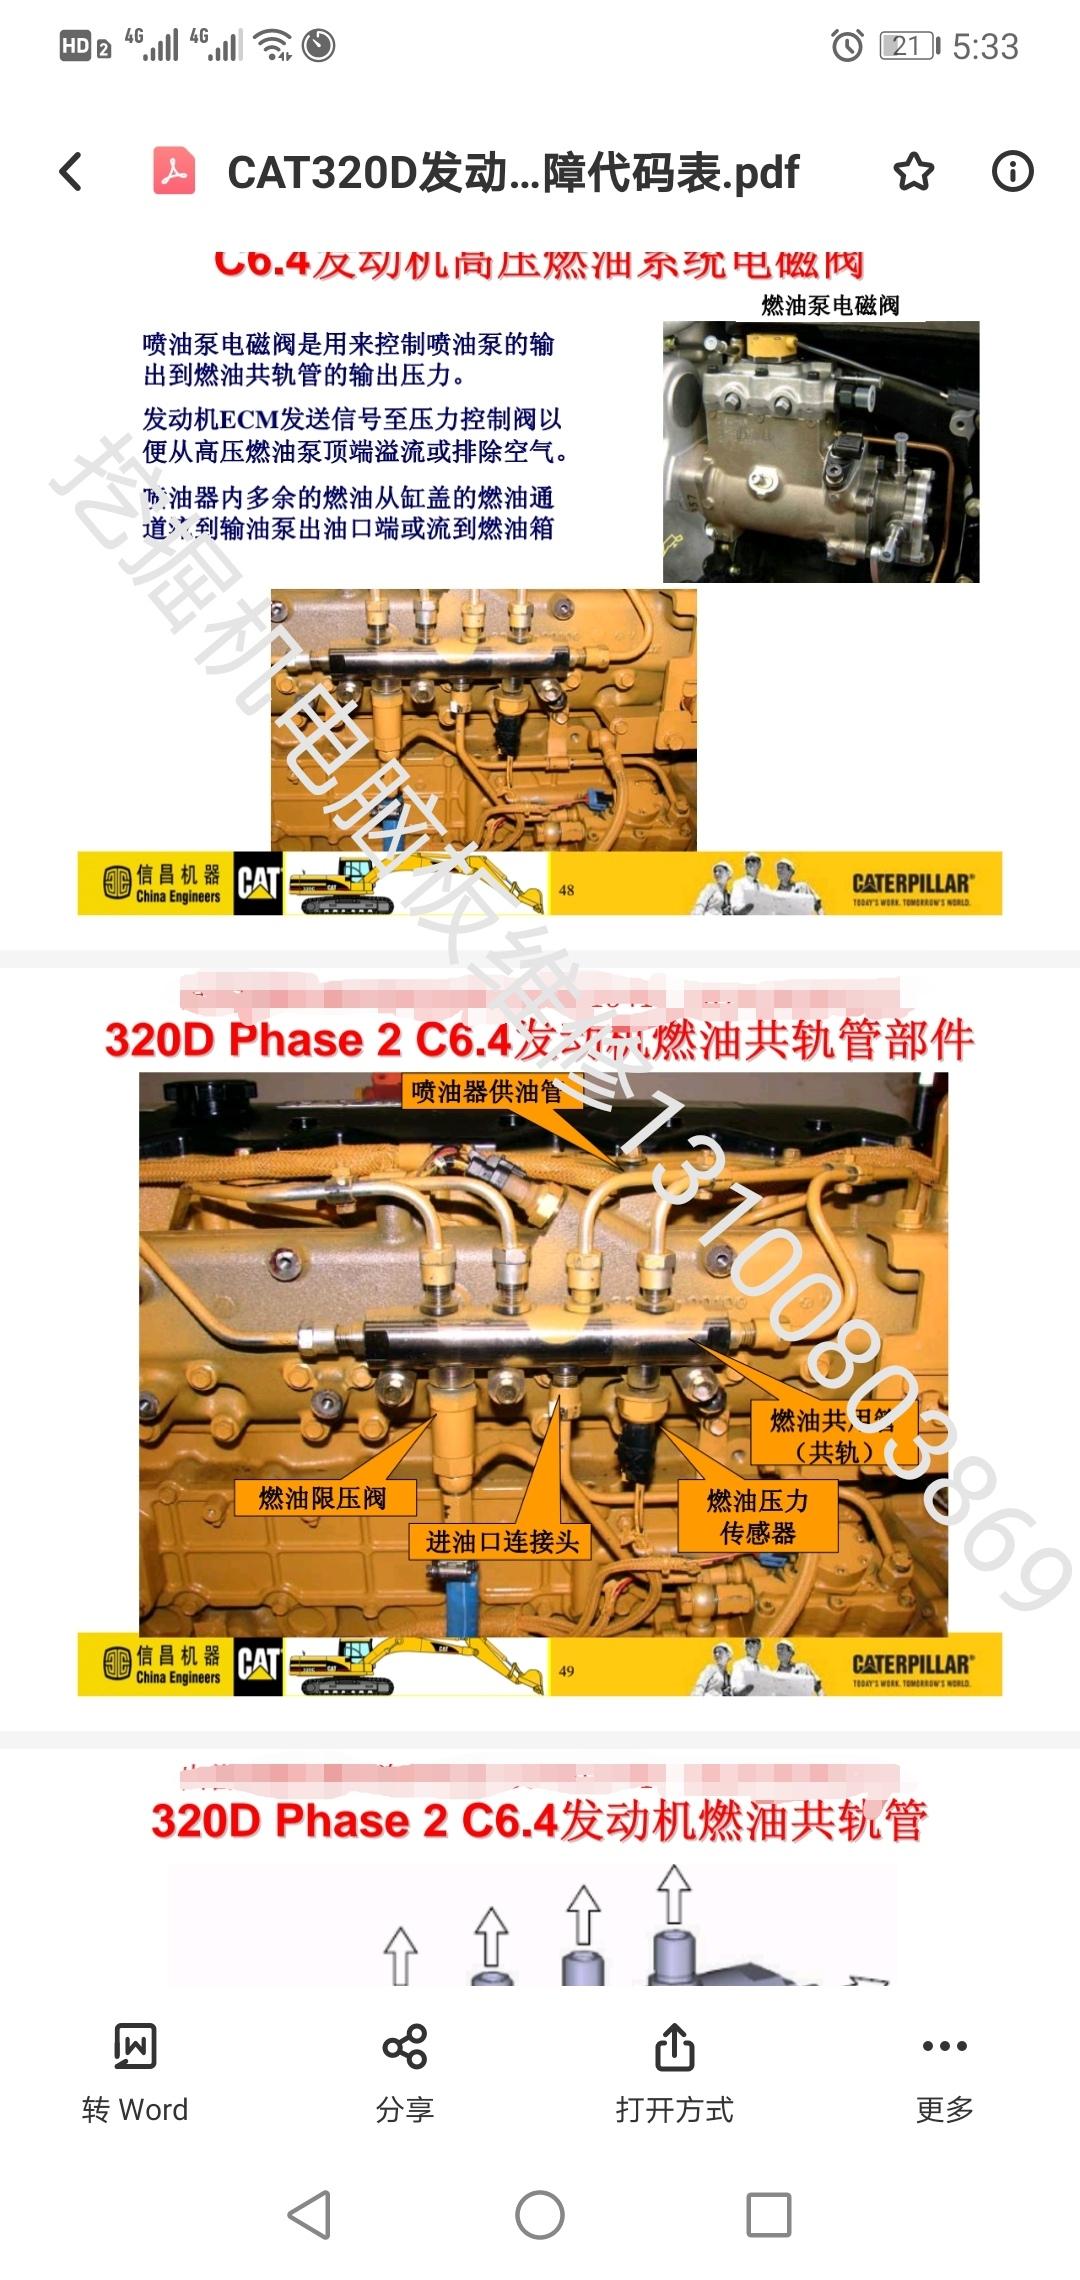 CAT320D液压全车慢发动机无力